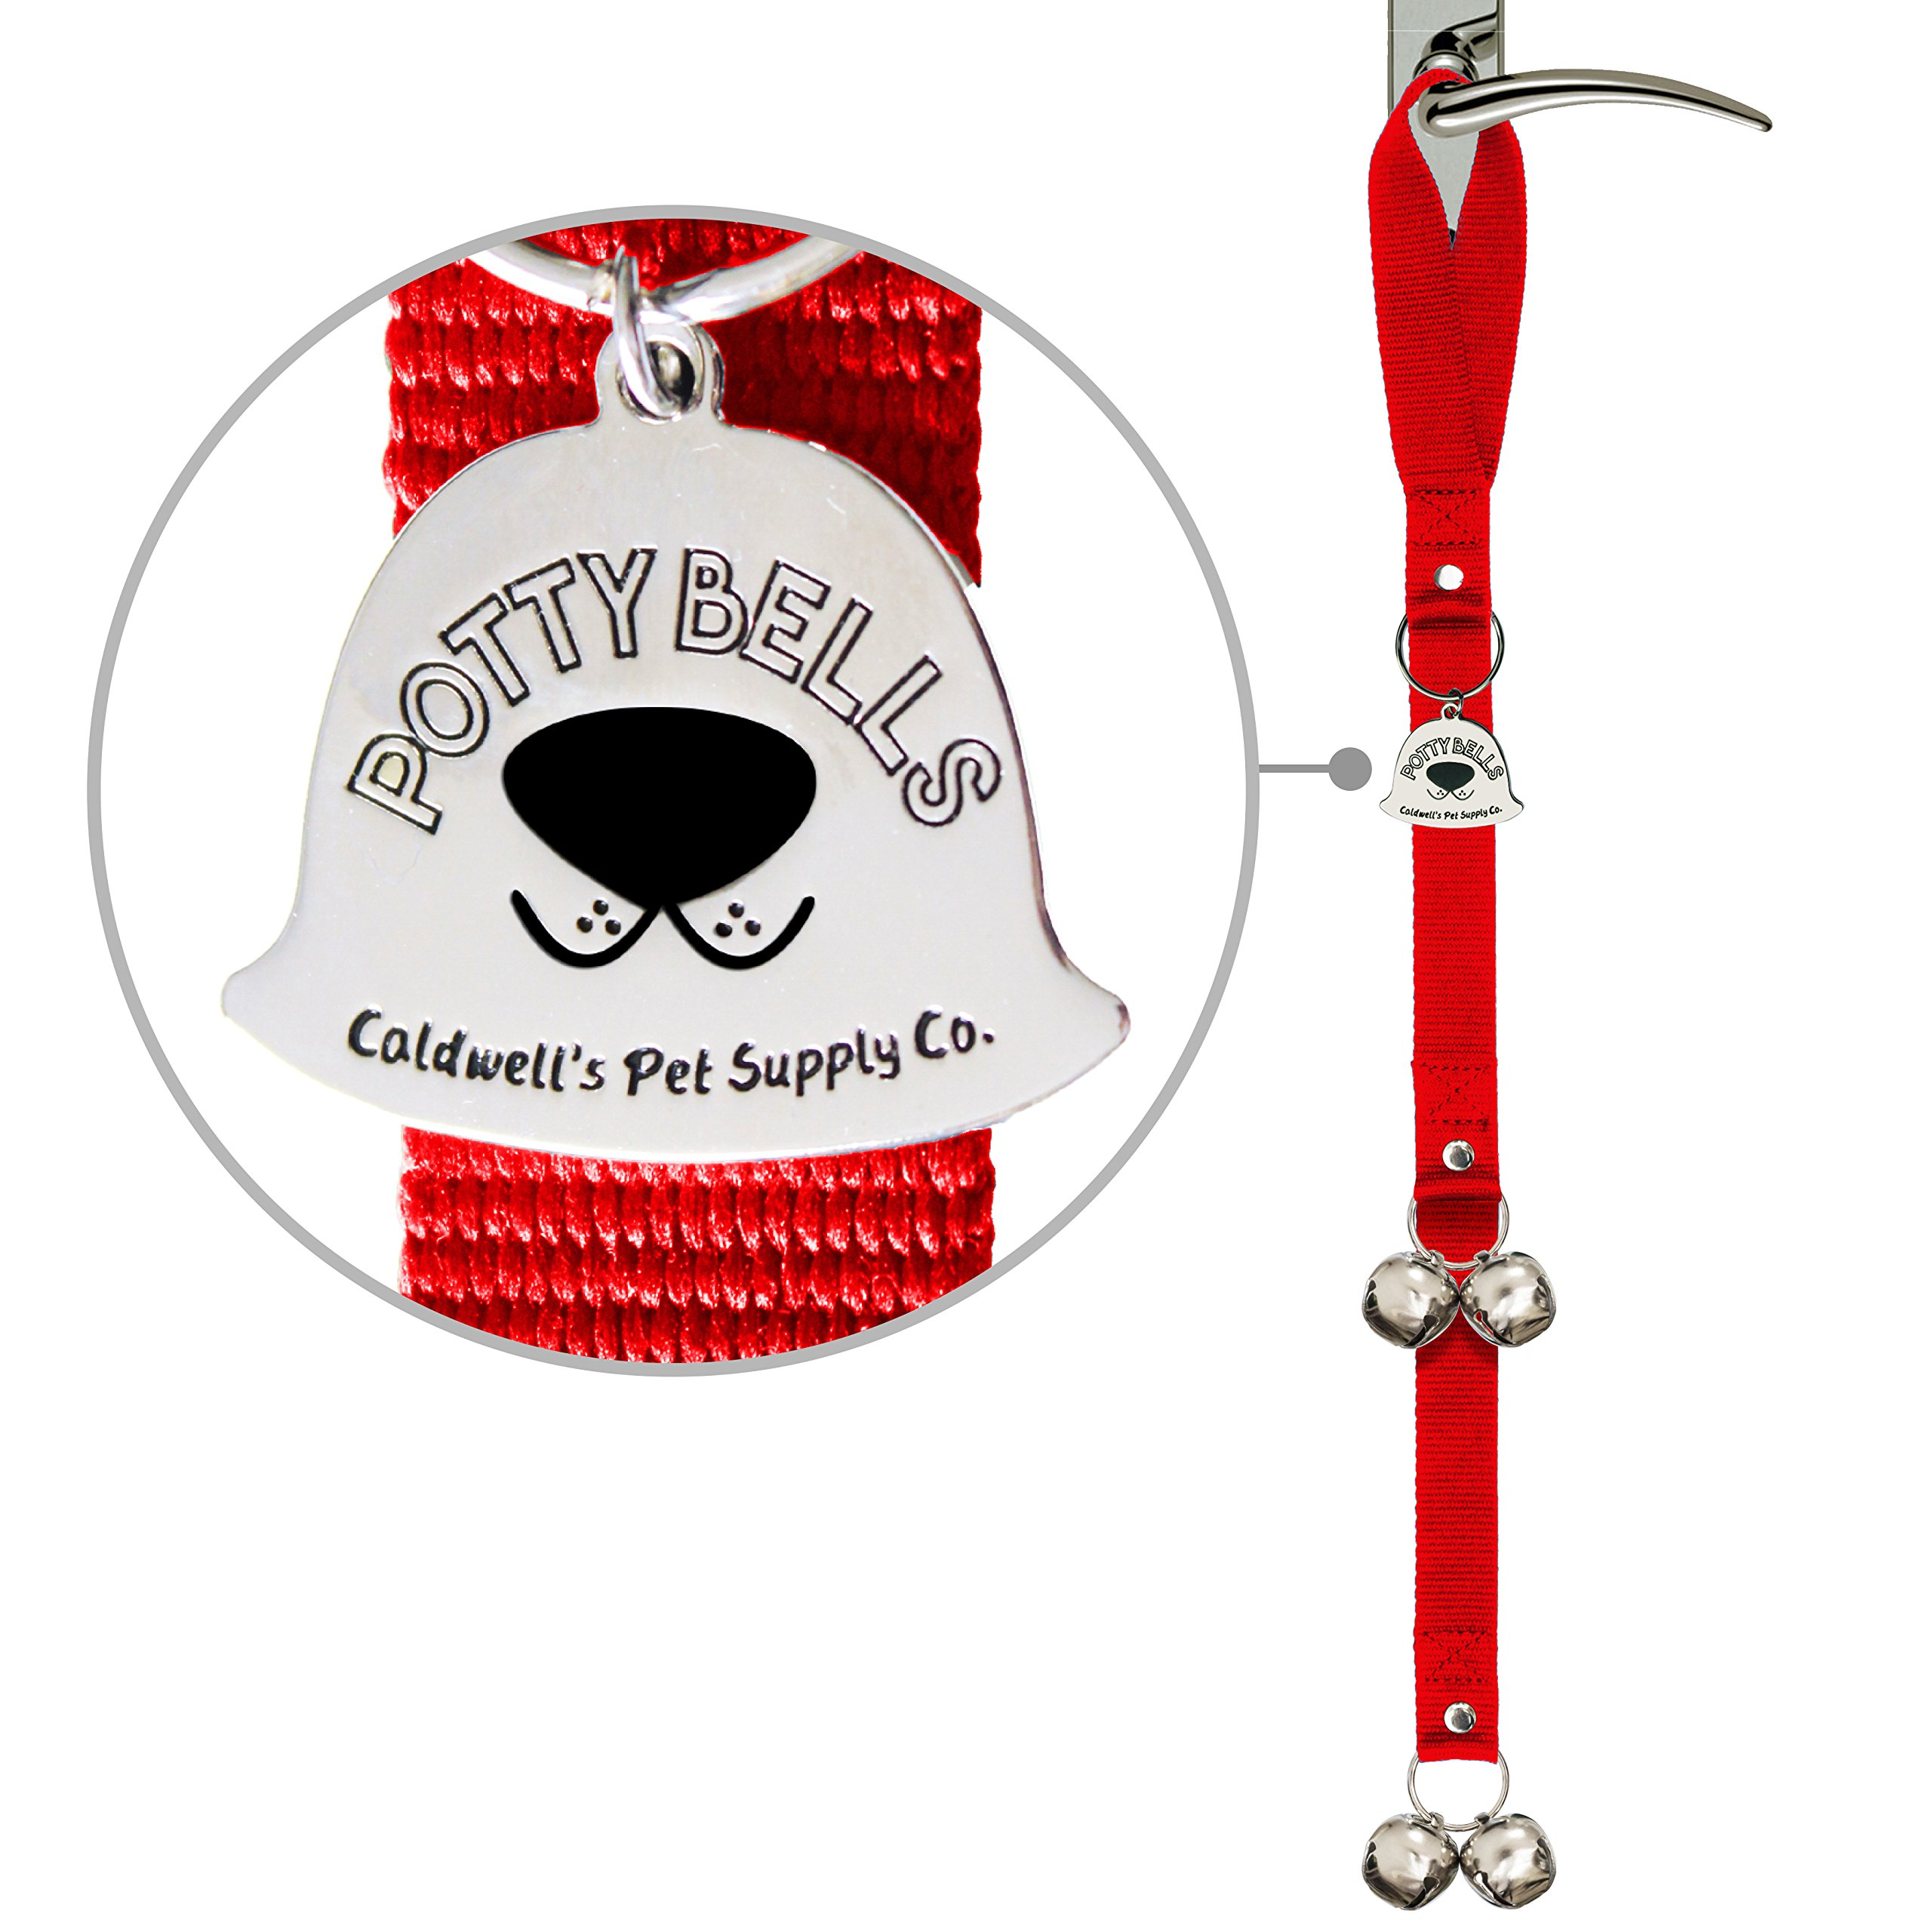 Potty Bells Housetraining Dog Doorbells for Dog Training and Housebreaking